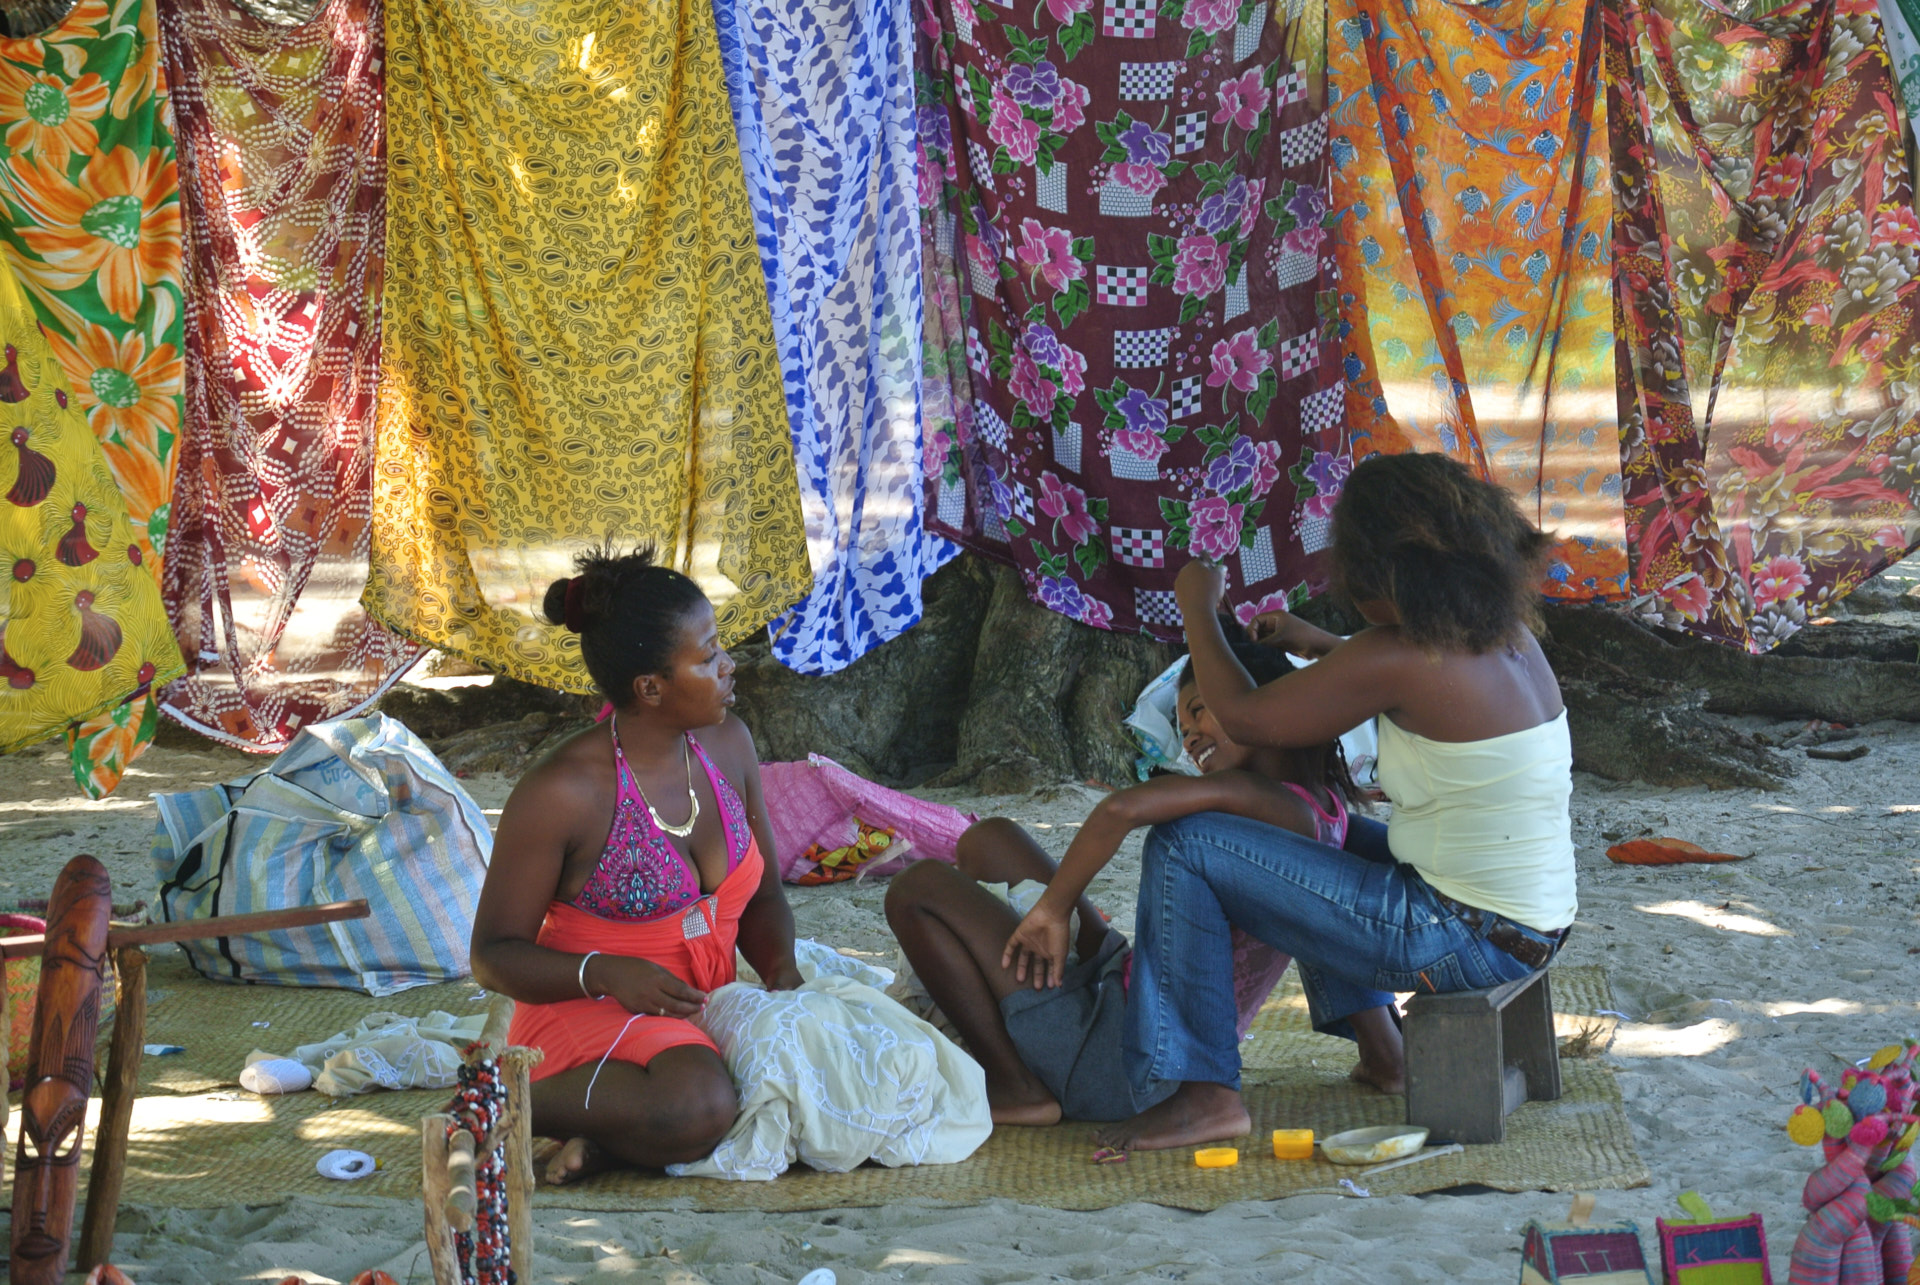 ragazze malgasce